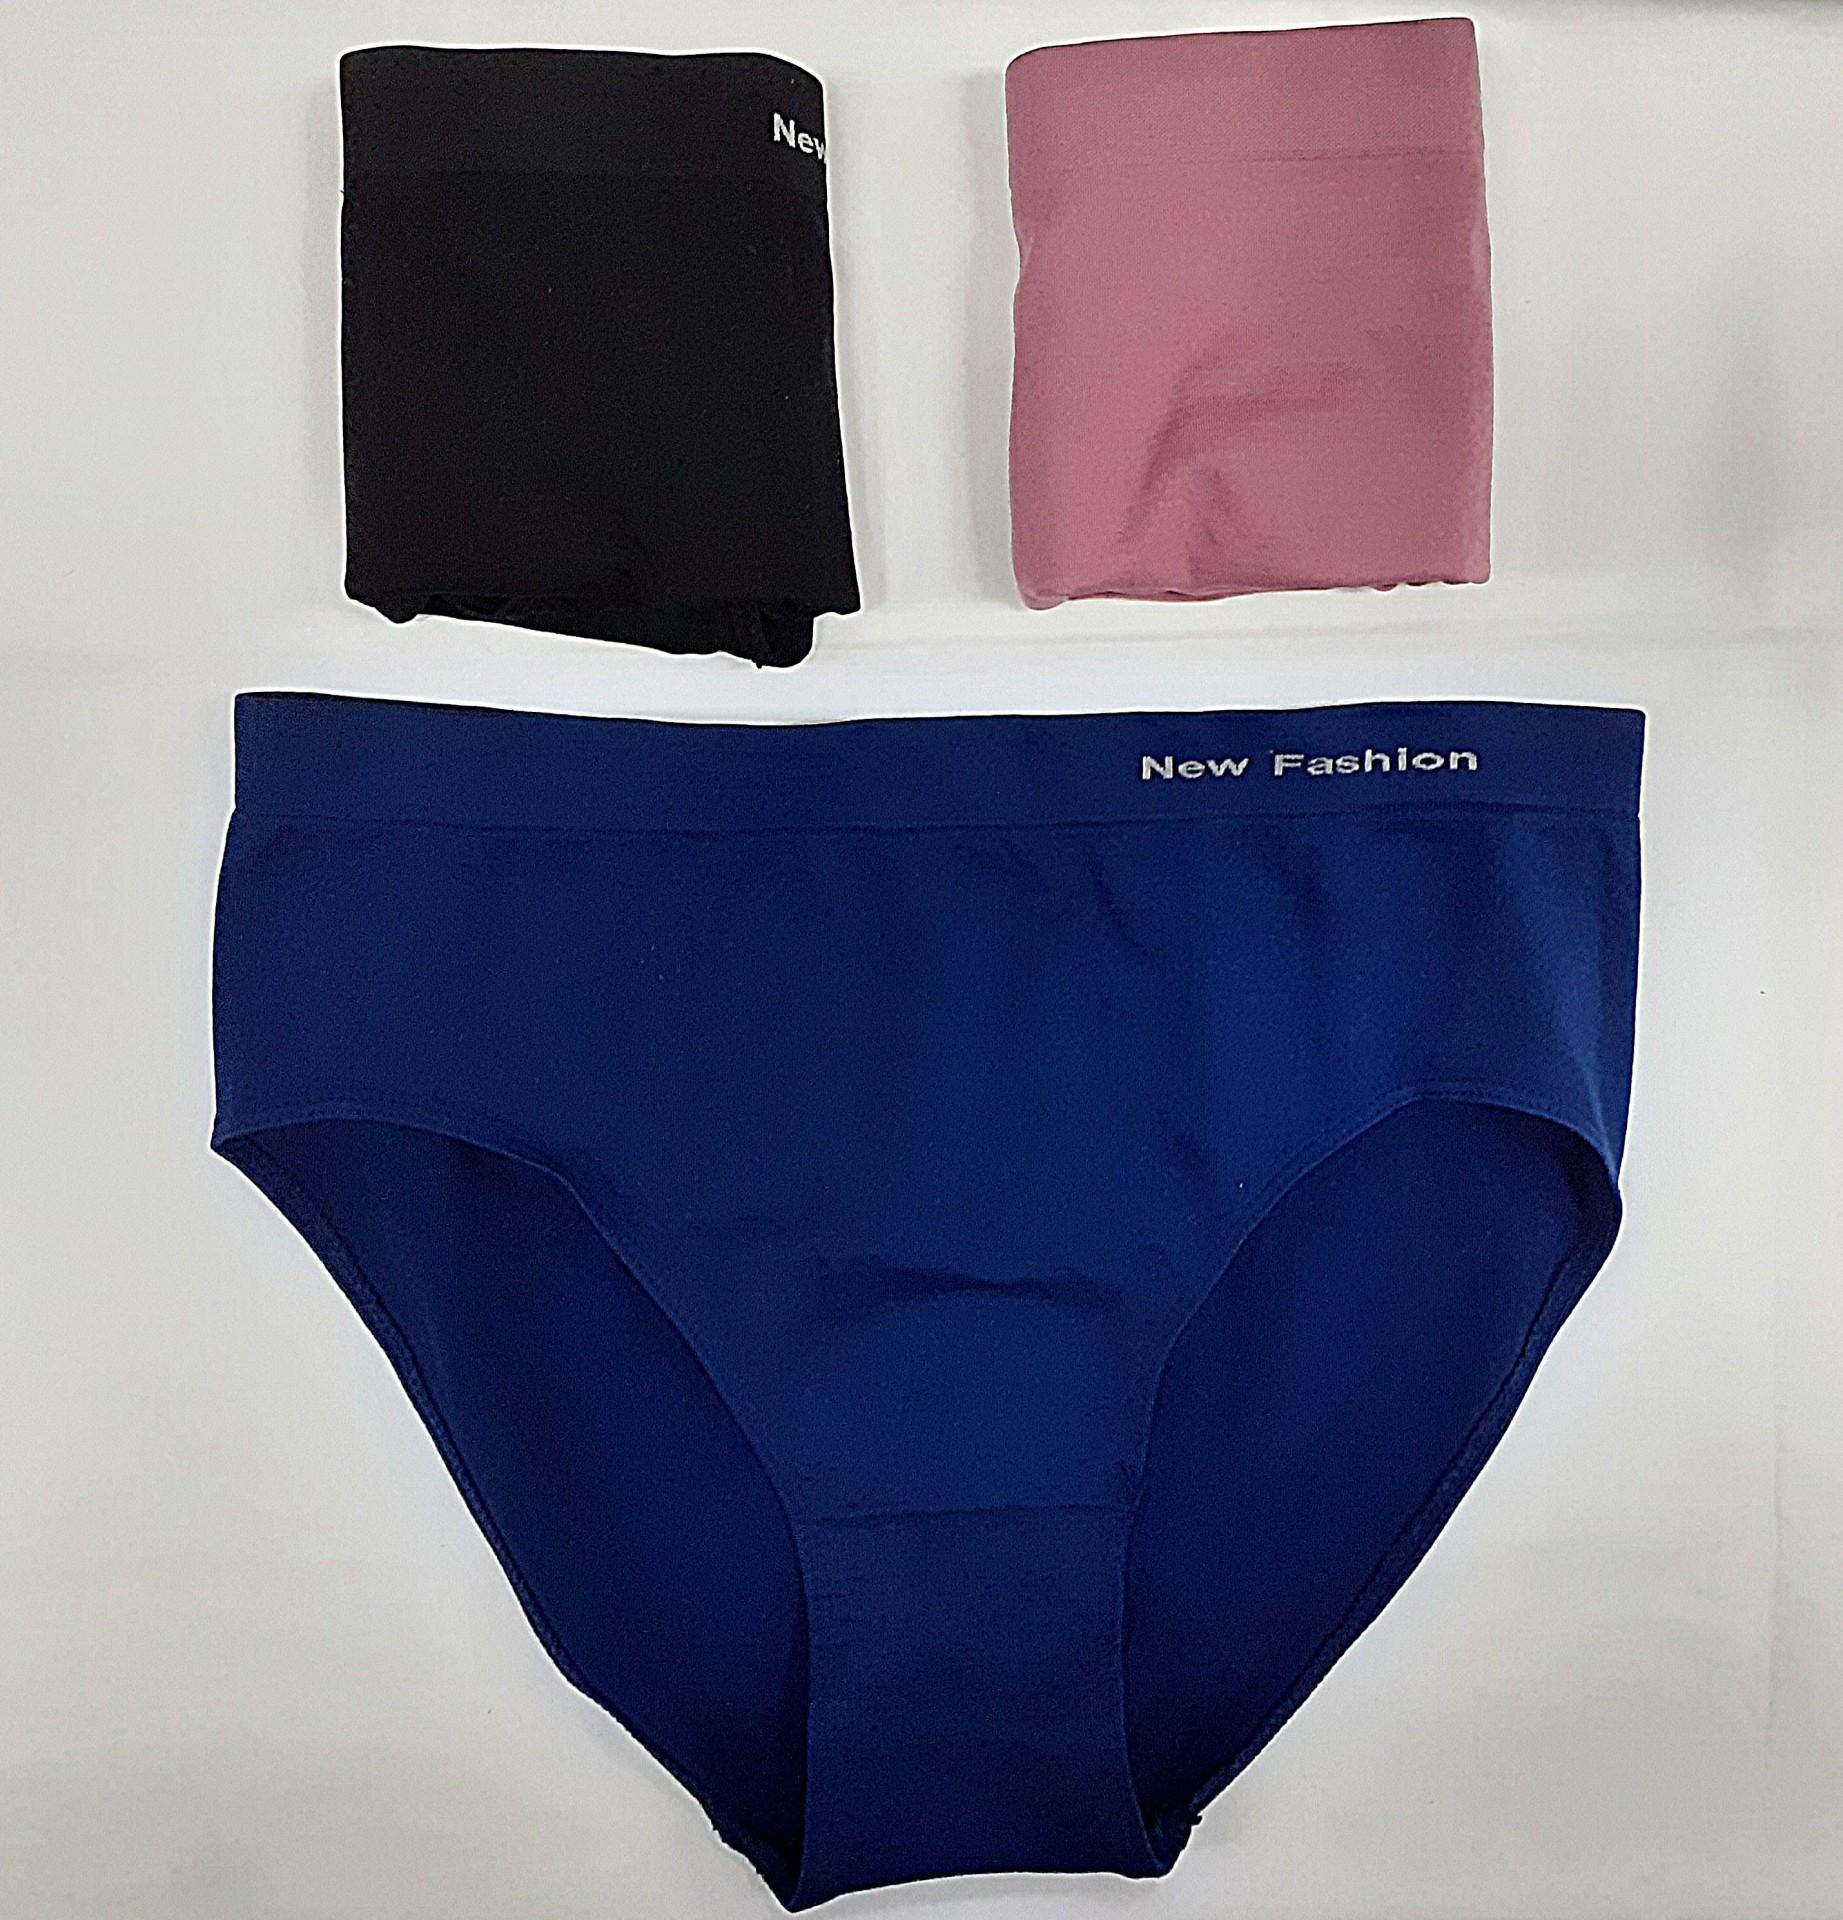 Cueca Senhora S/Costuras New Fashion